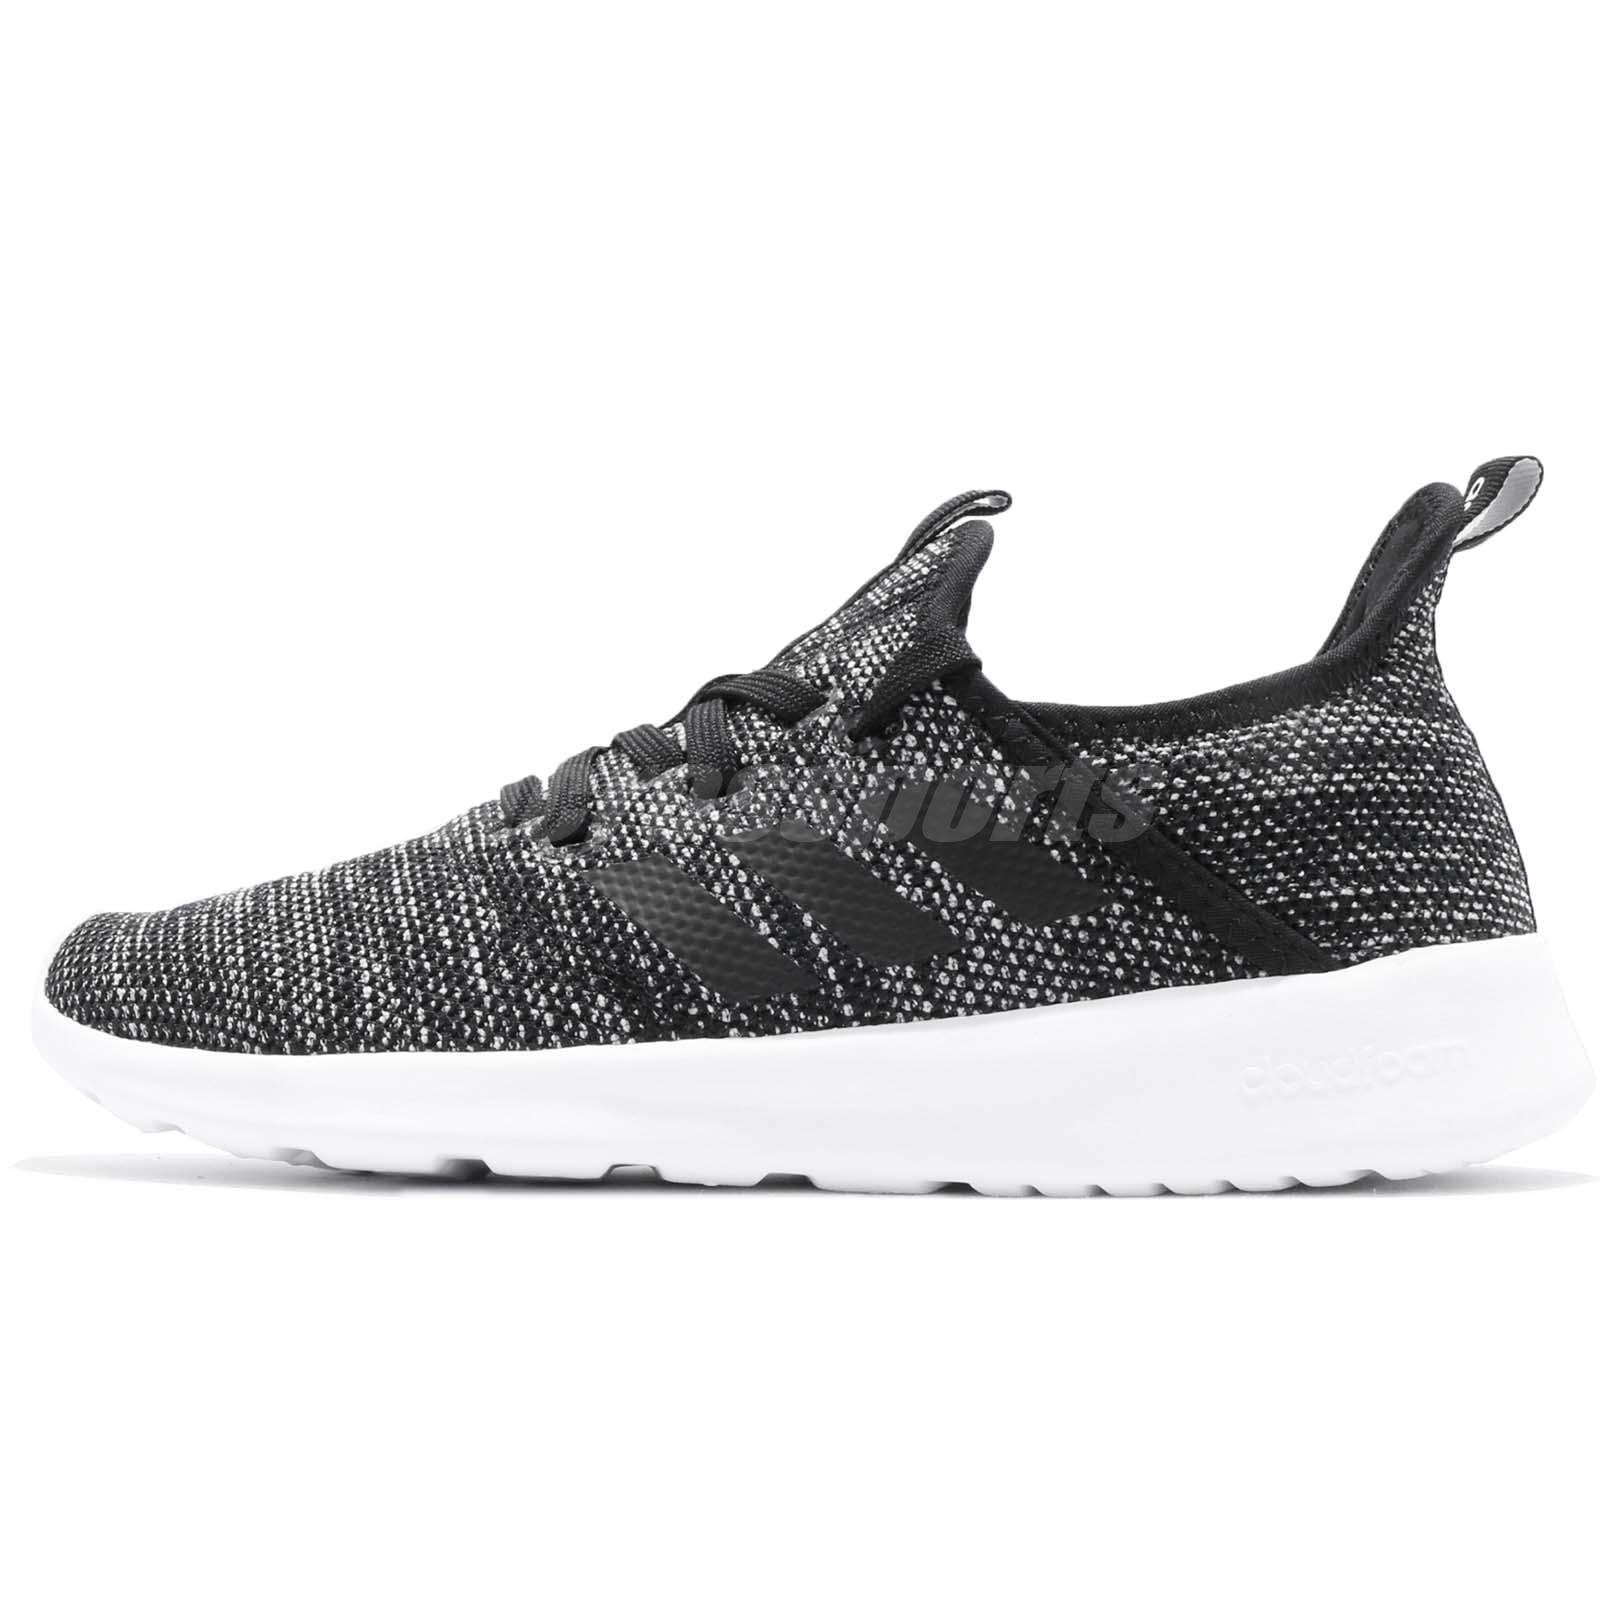 size 40 b8564 c3414 adidas Cloudfoam Pure Black White Women Running Casual Shoes Sneakers DB0694